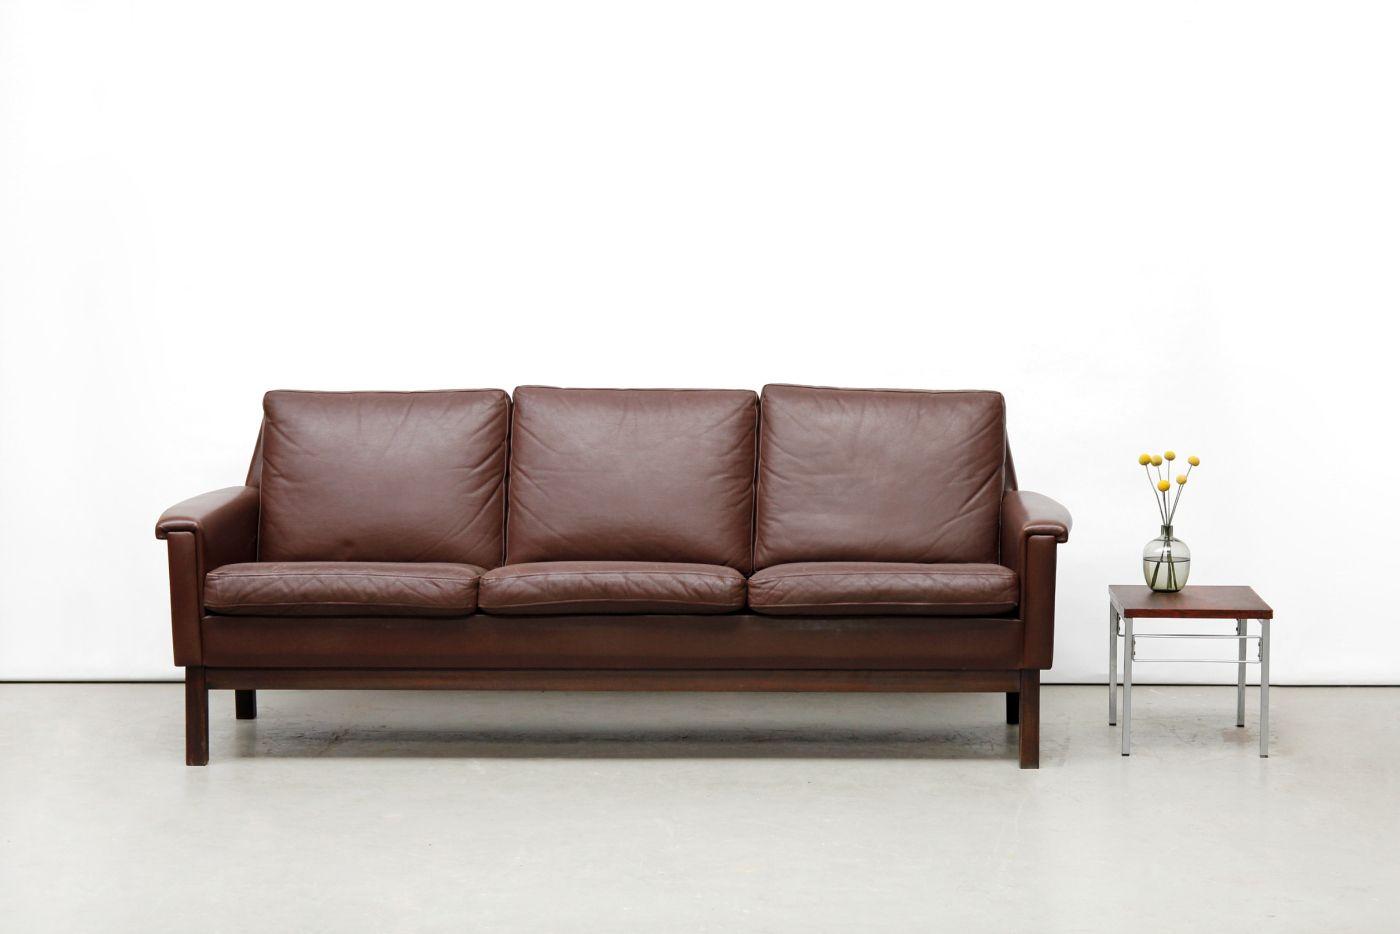 Vintage Leren Bank : Vintage deens design bruine leren bank danish design brown leather